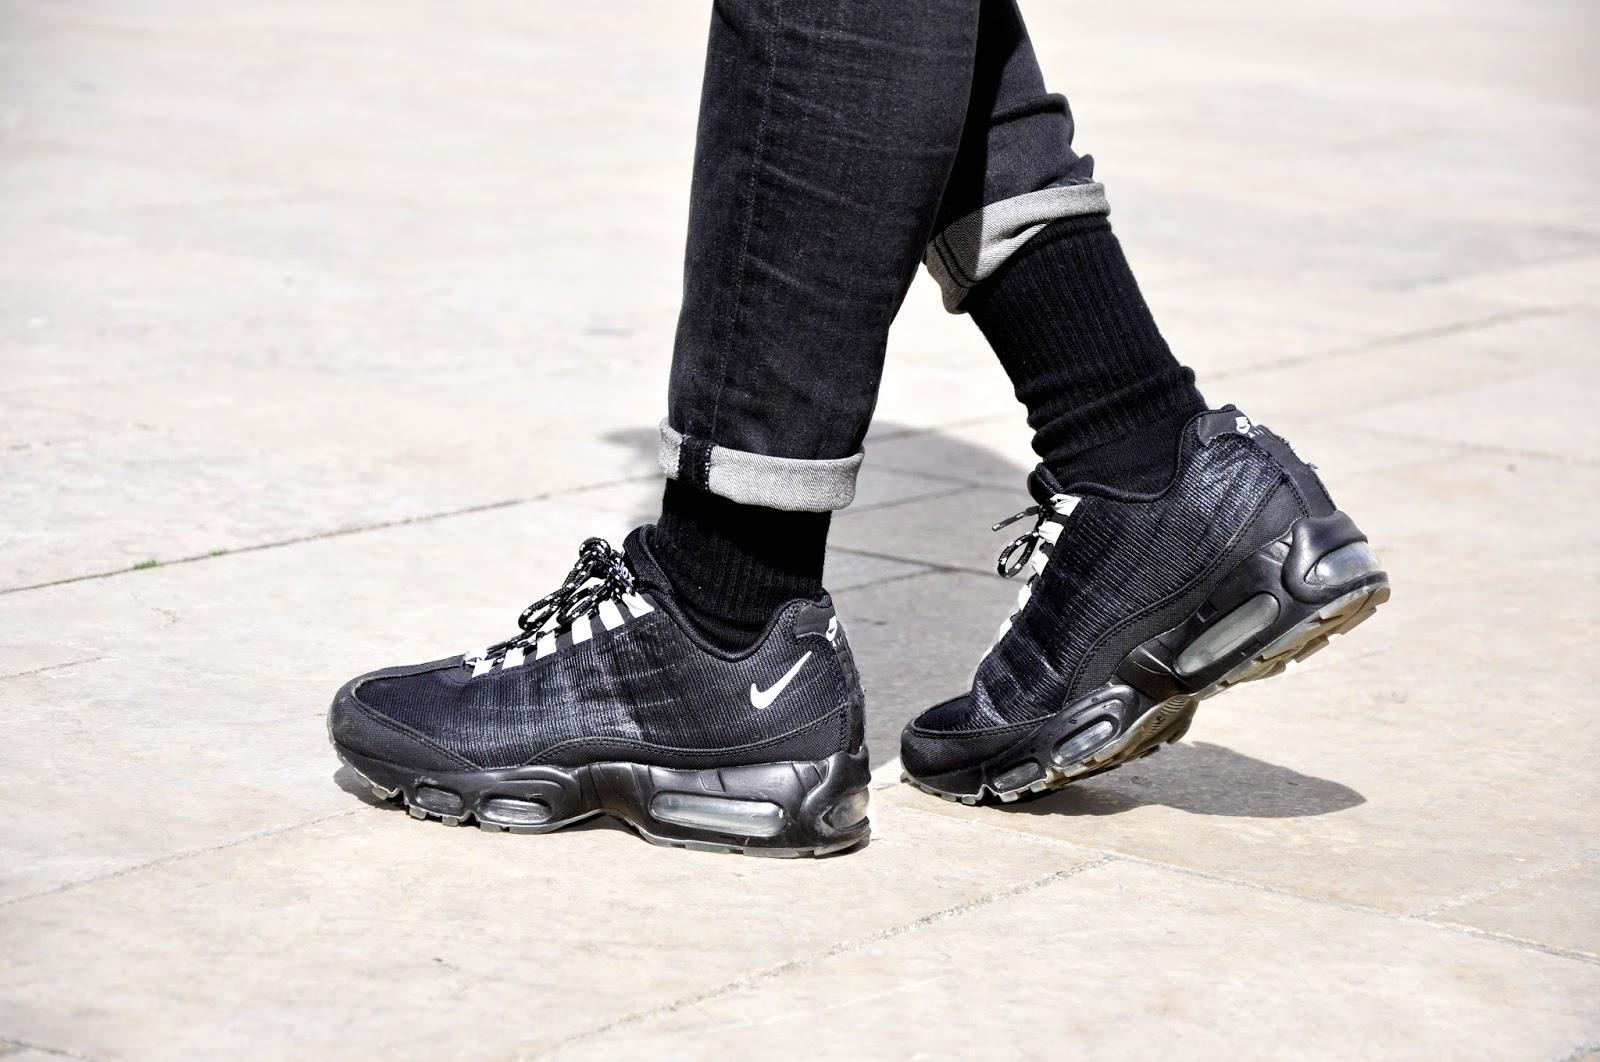 sale retailer 7a975 df703 air max 95 porte,Chaussures Homme Nike Air Max 95 V SP Blanc Gris Jaune  Fluo Noir Anthracite